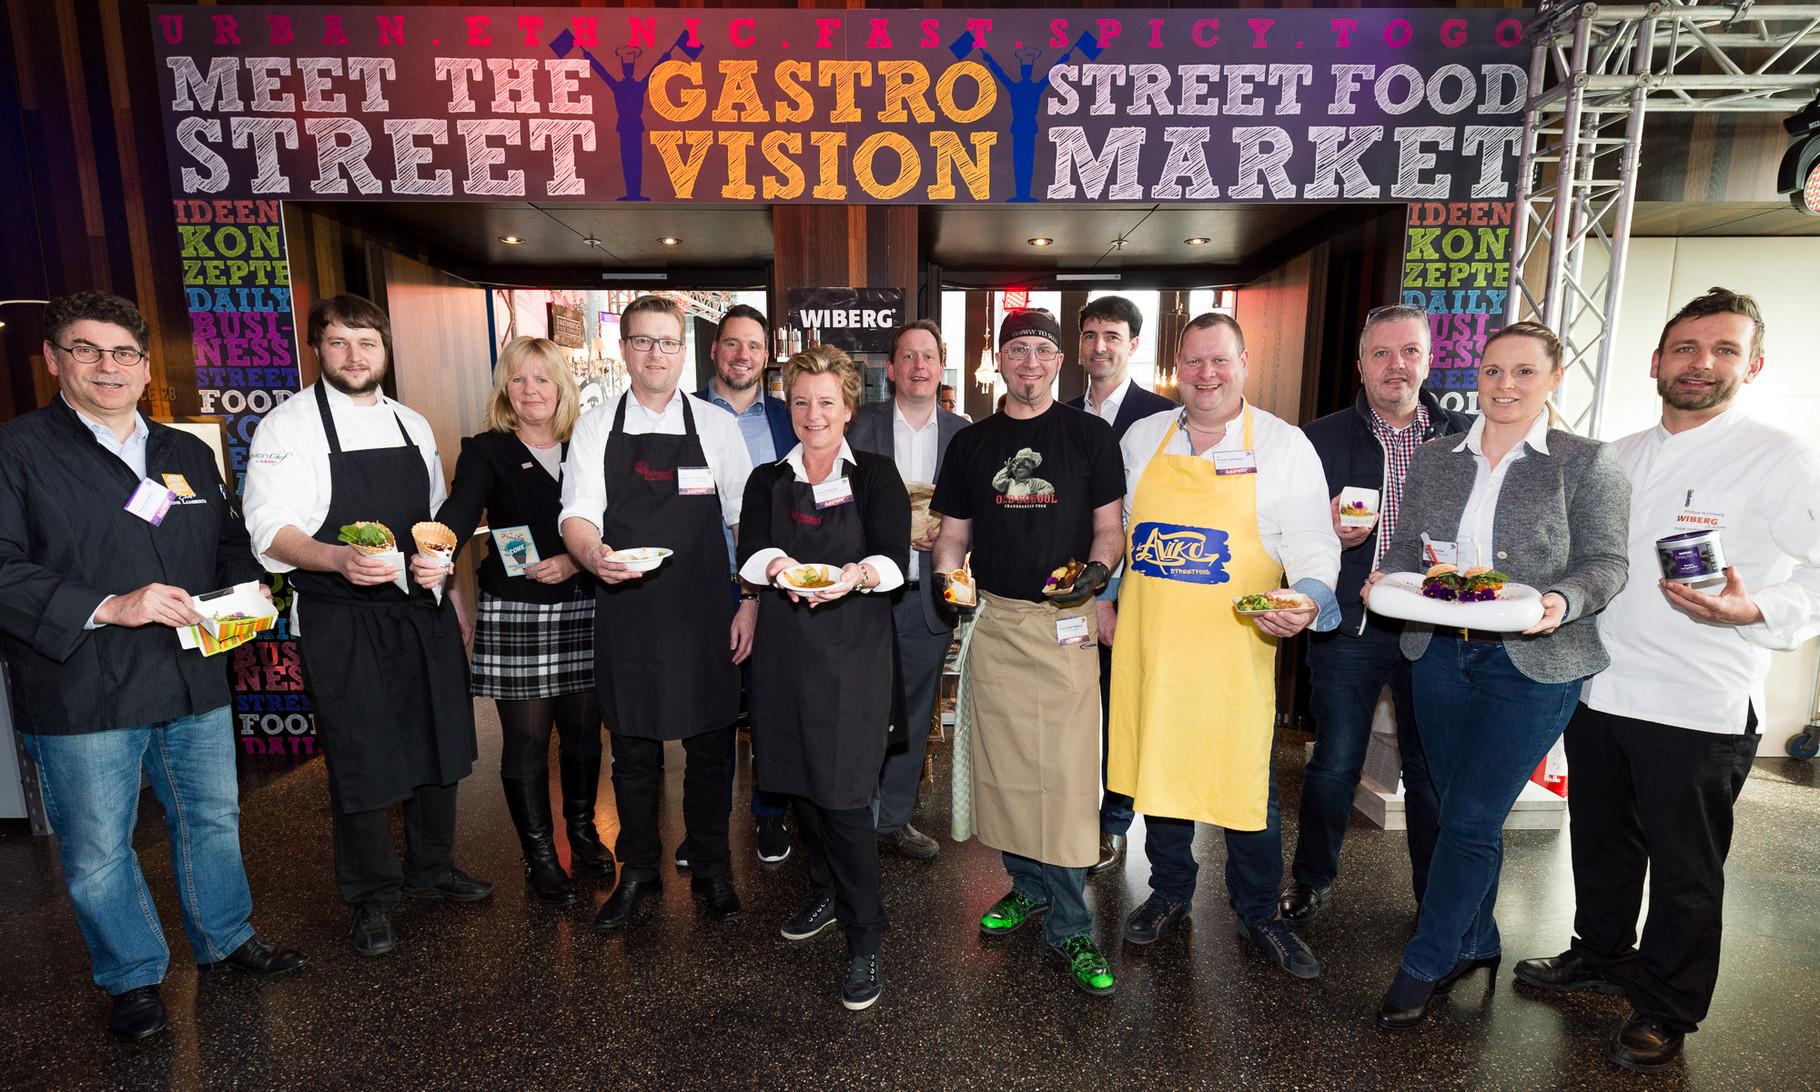 Gastro Vision 2016